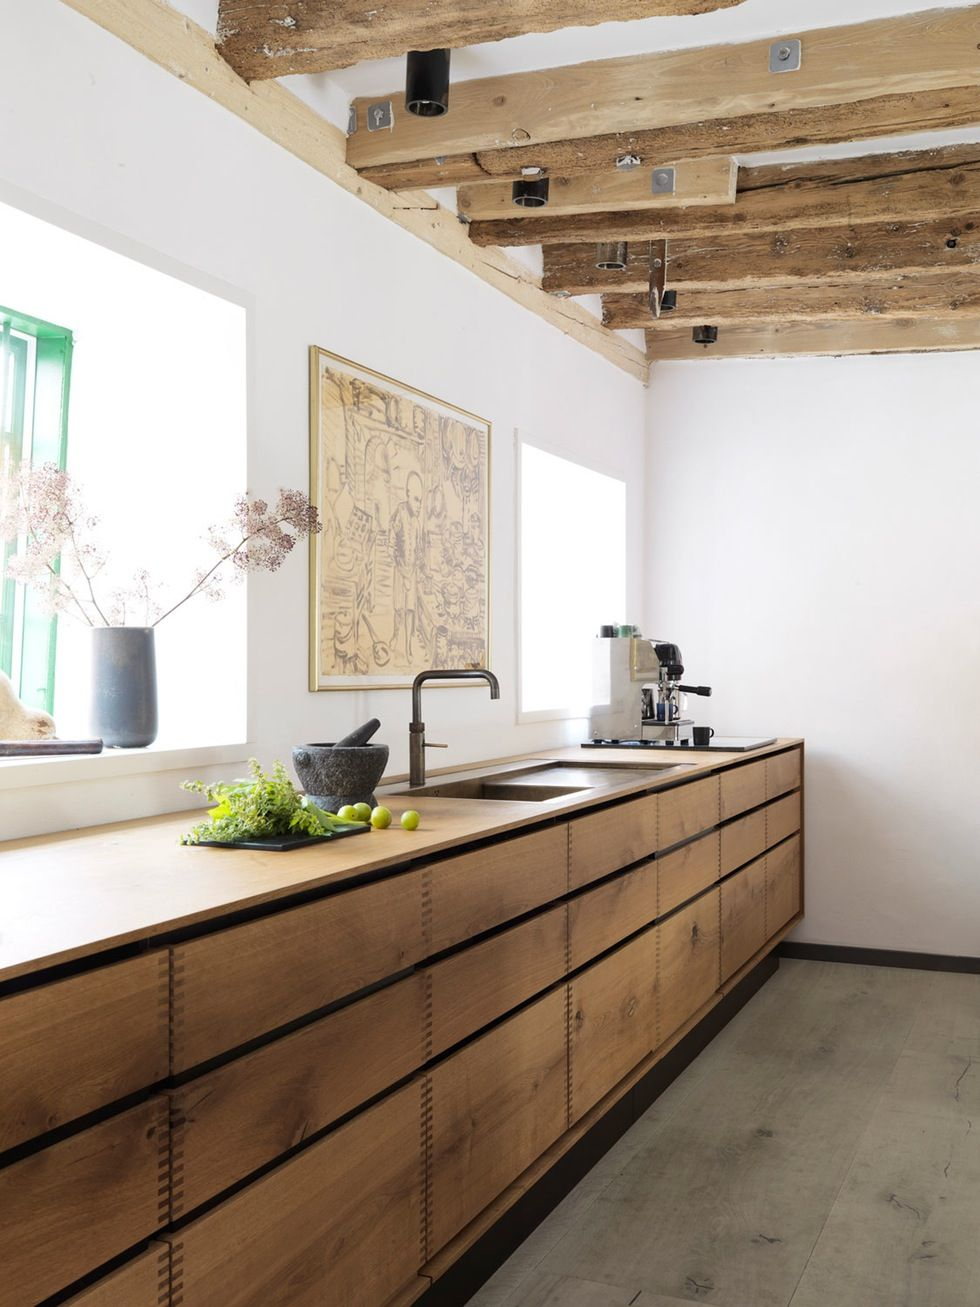 Kitchen No Wall Cabinets Nadine Og Renc Redzepis Christianshavn Hus Kbenhavn